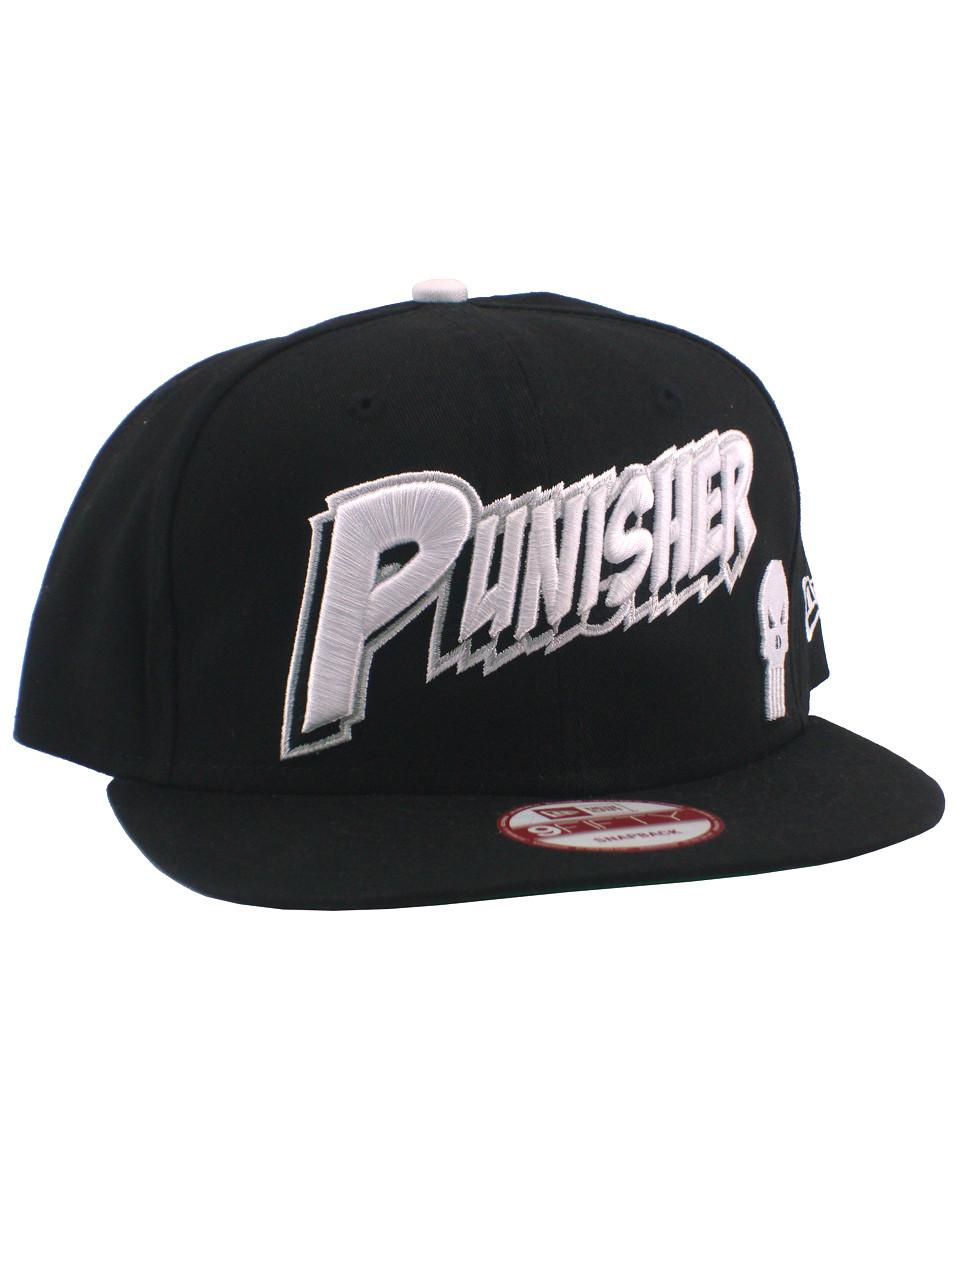 Punisher comic text new era fifty snapback hat boondock collectibles jpg  953x1280 New era punisher hat bebbe86593ef